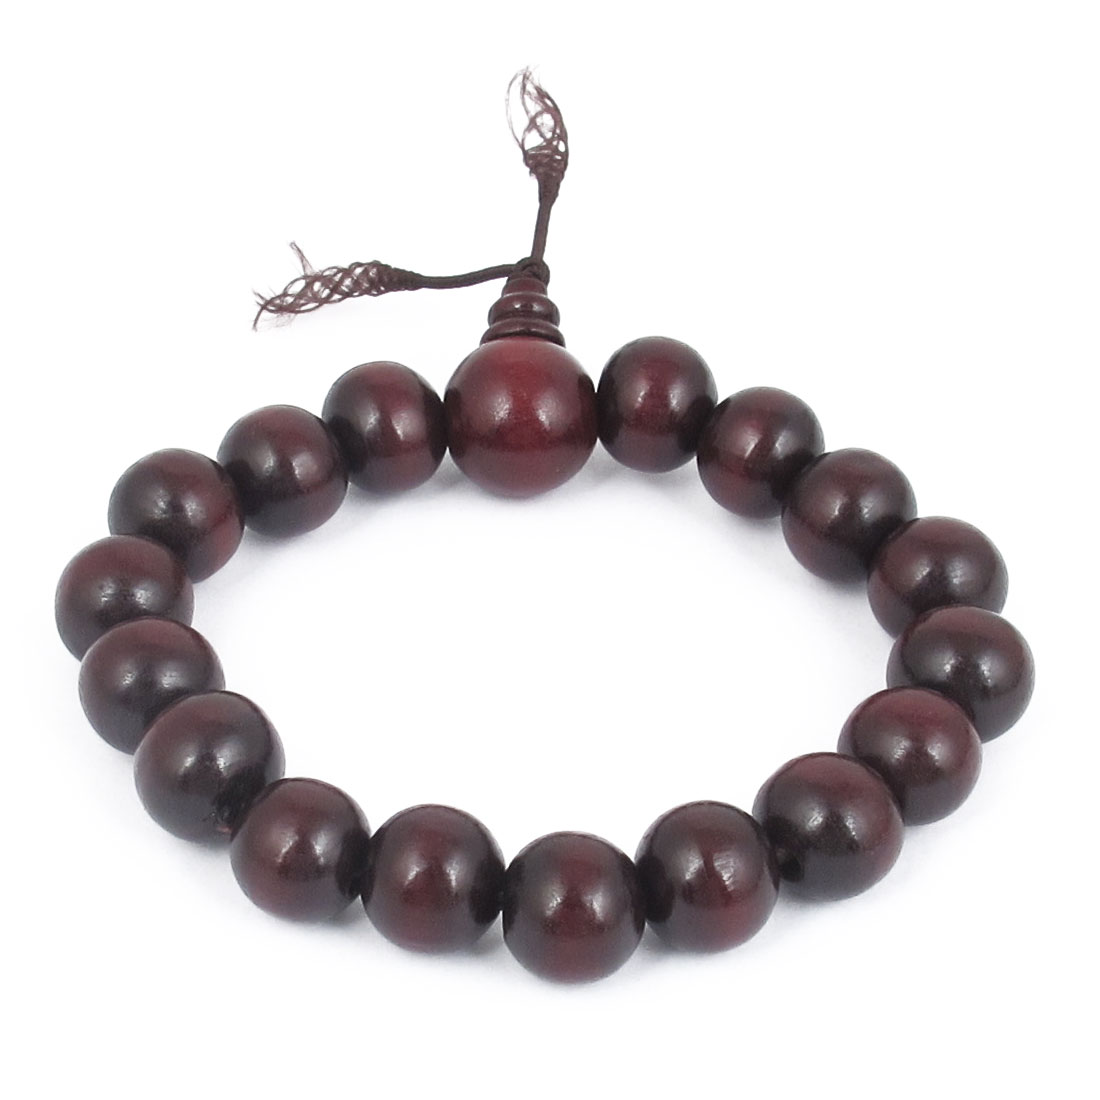 22cm Girth Dark Brown Wood Round Beaded Linked Elastic Wrist Bracelet Ornament for Unisex